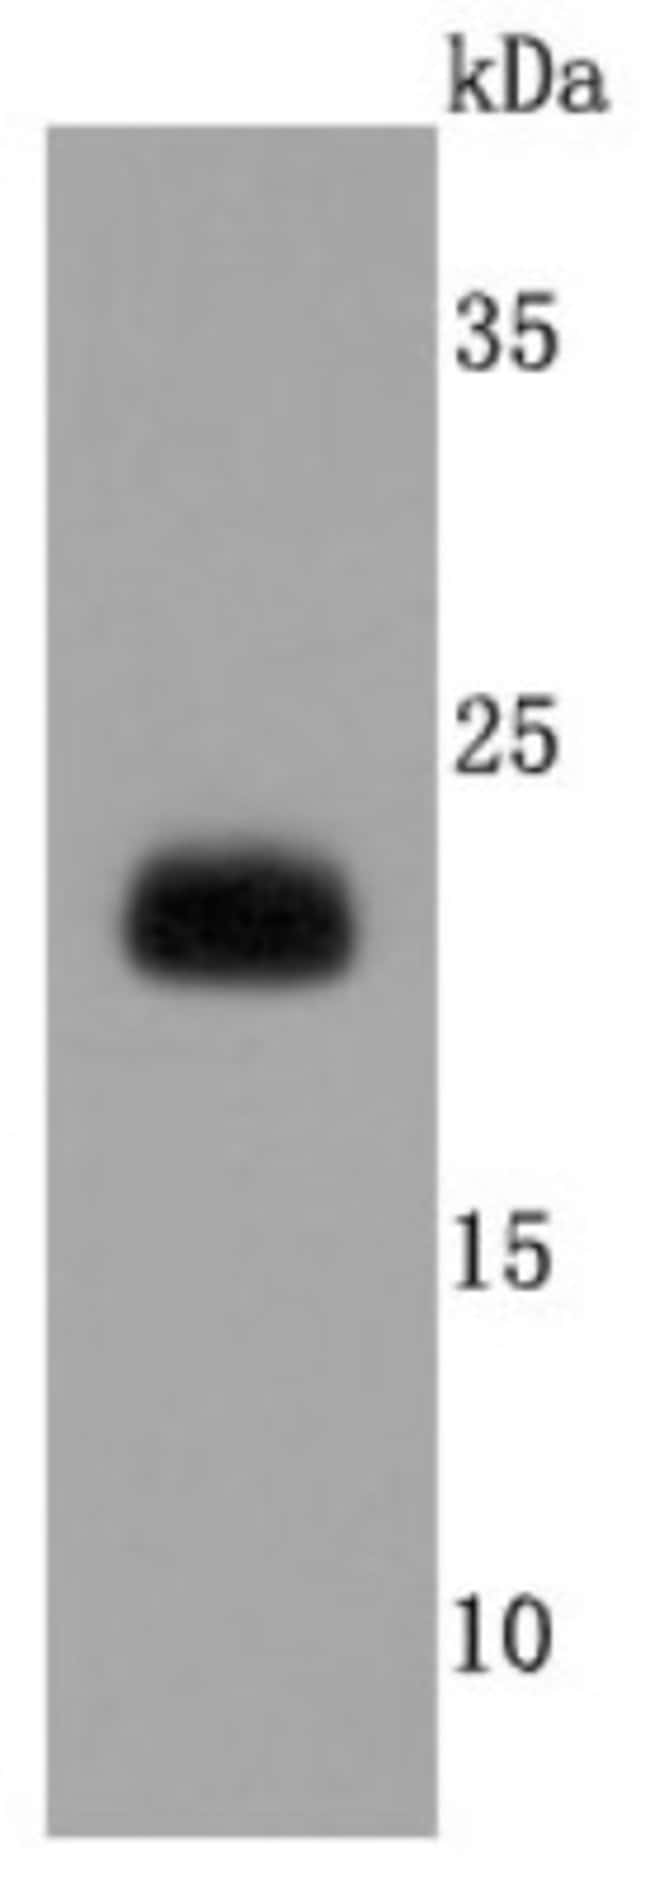 Lipocalin-2/NGAL Rabbit anti-Human, Clone: JM10-67, Novus Biologicals 100µL